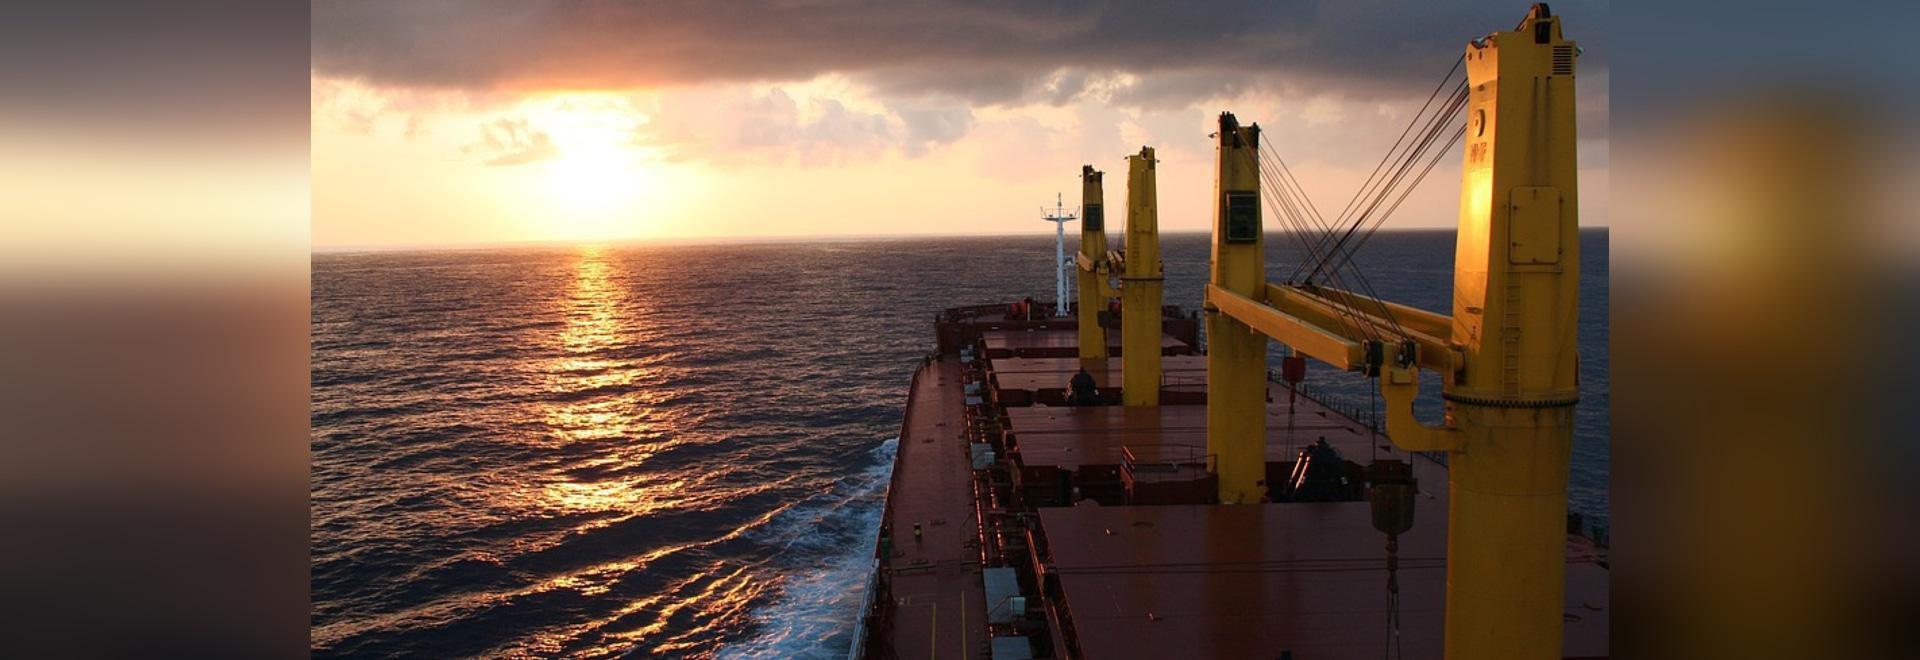 Scorpio Unveils Scrubber Order for 23 More Vessels